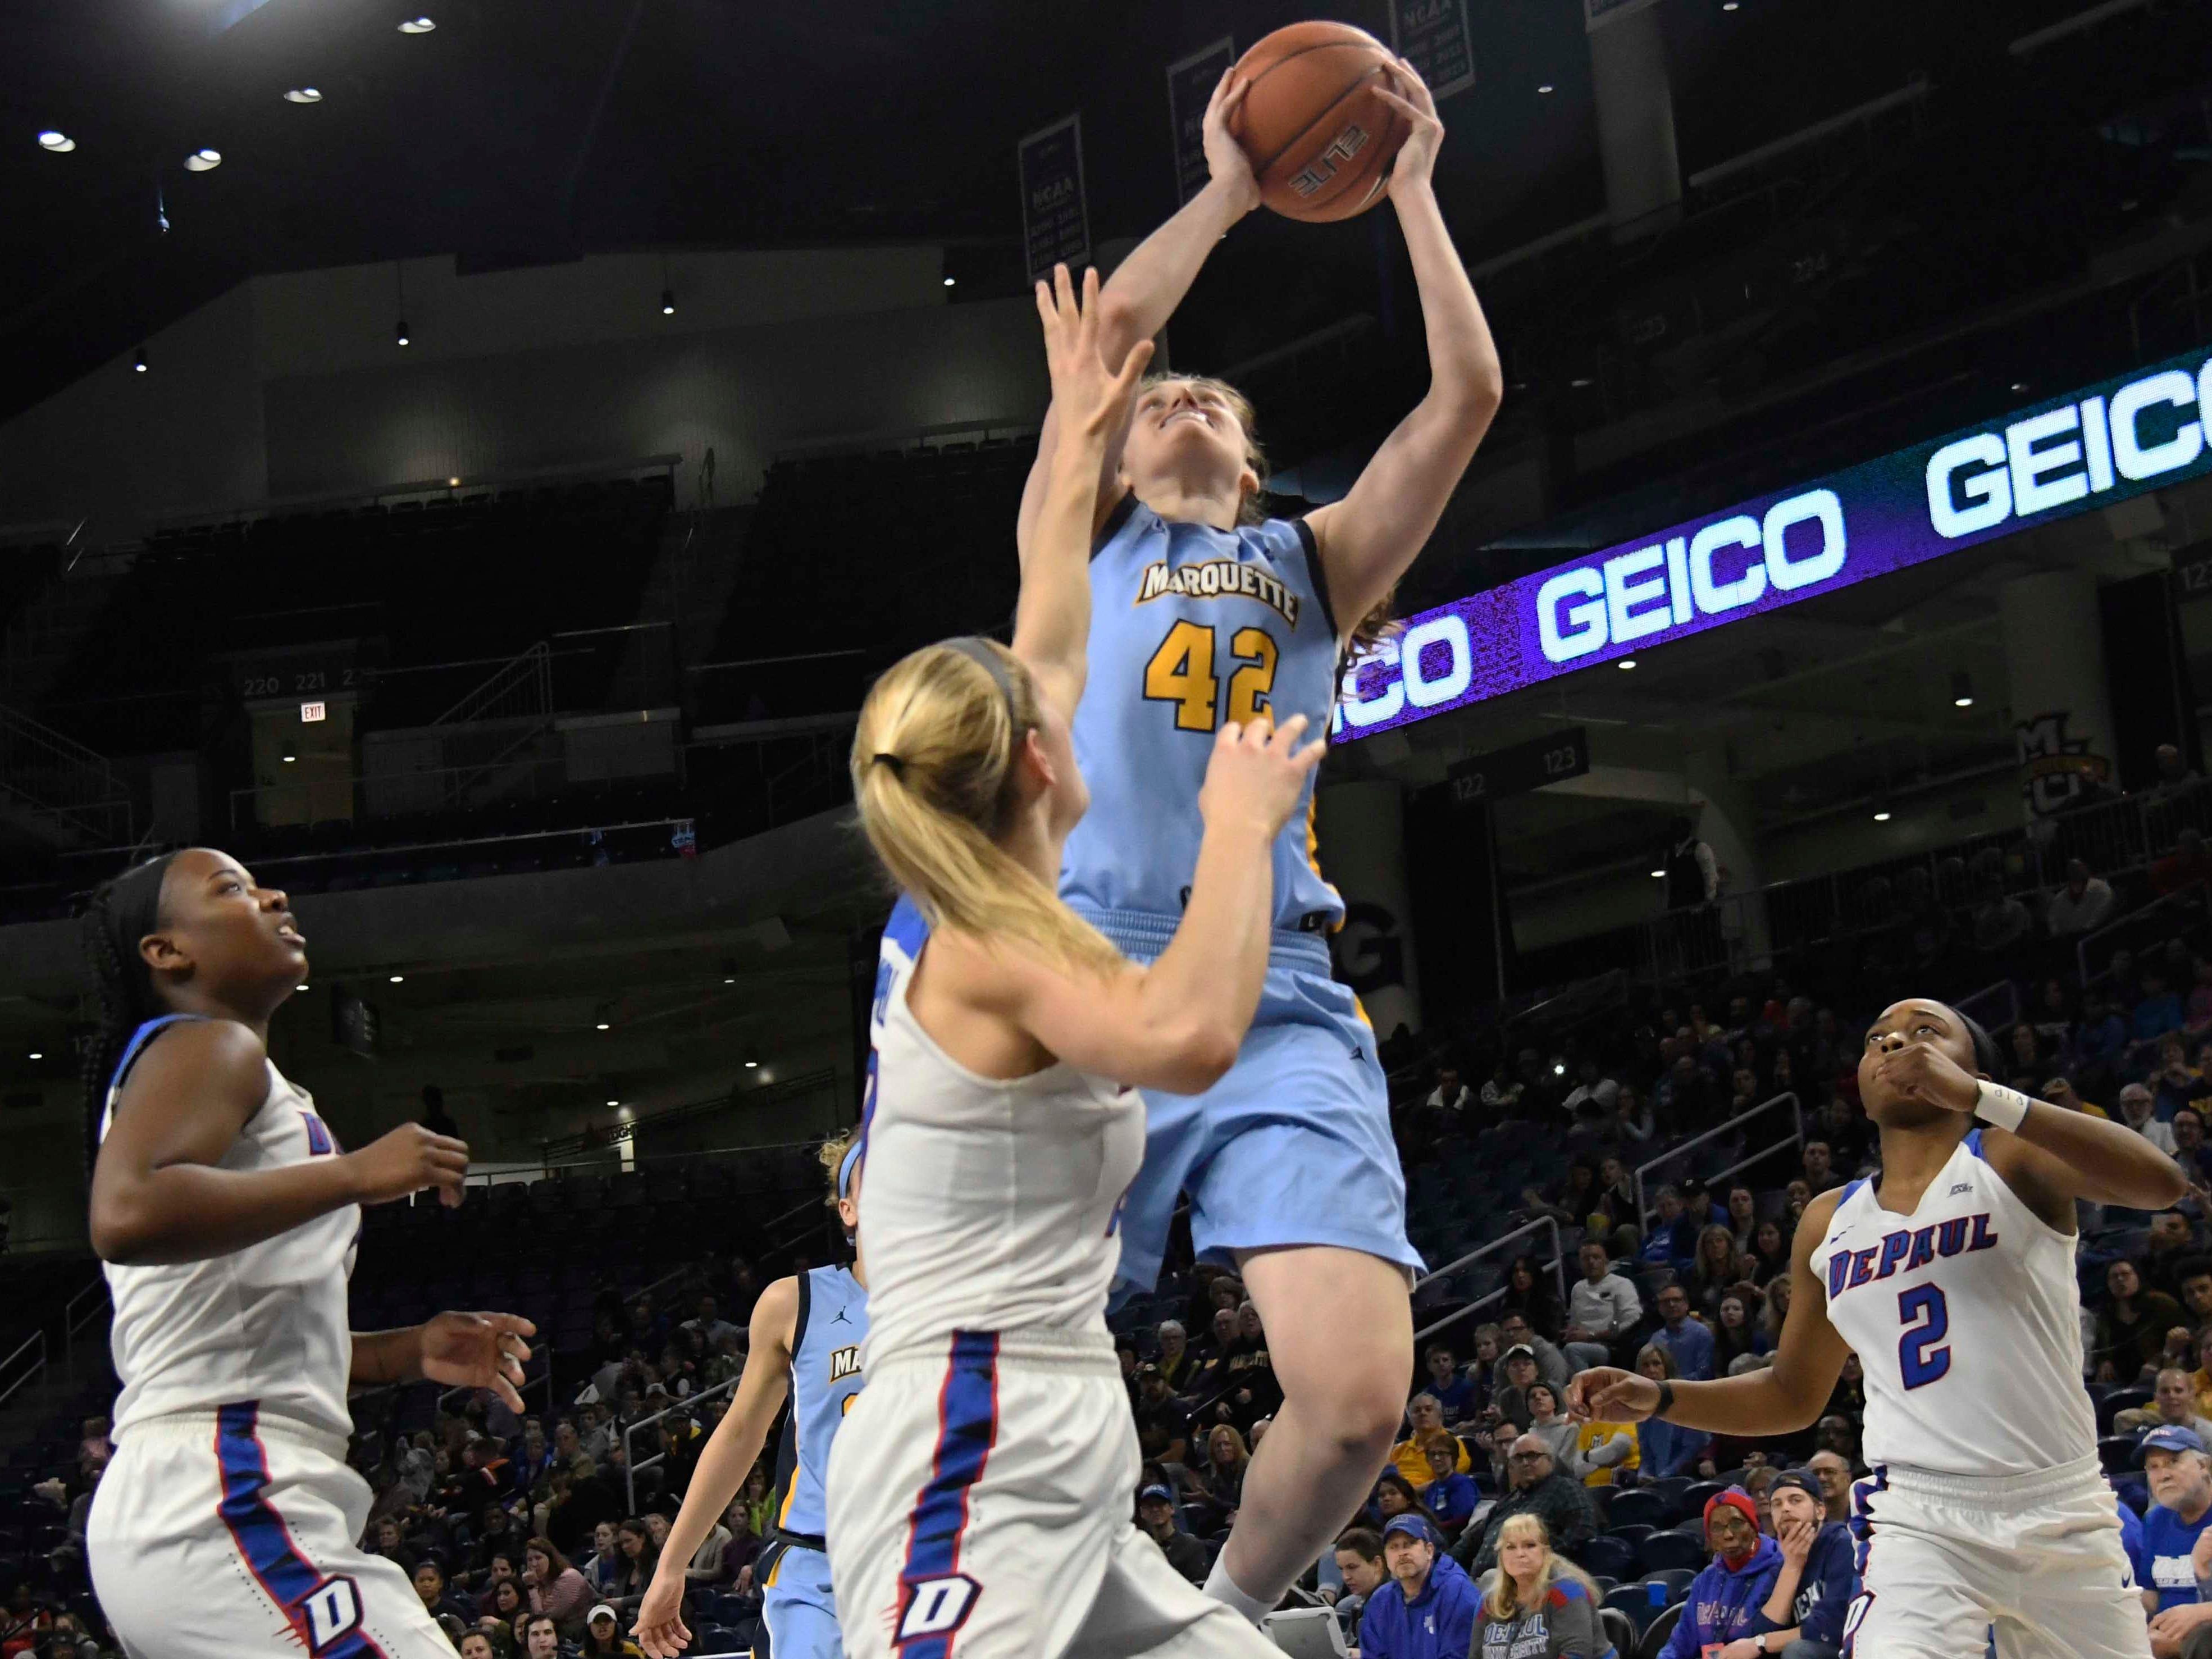 Golden Eagles guard Lauren Van Kleunen shoots over DePaul guard Kelly Campbell during the first half.